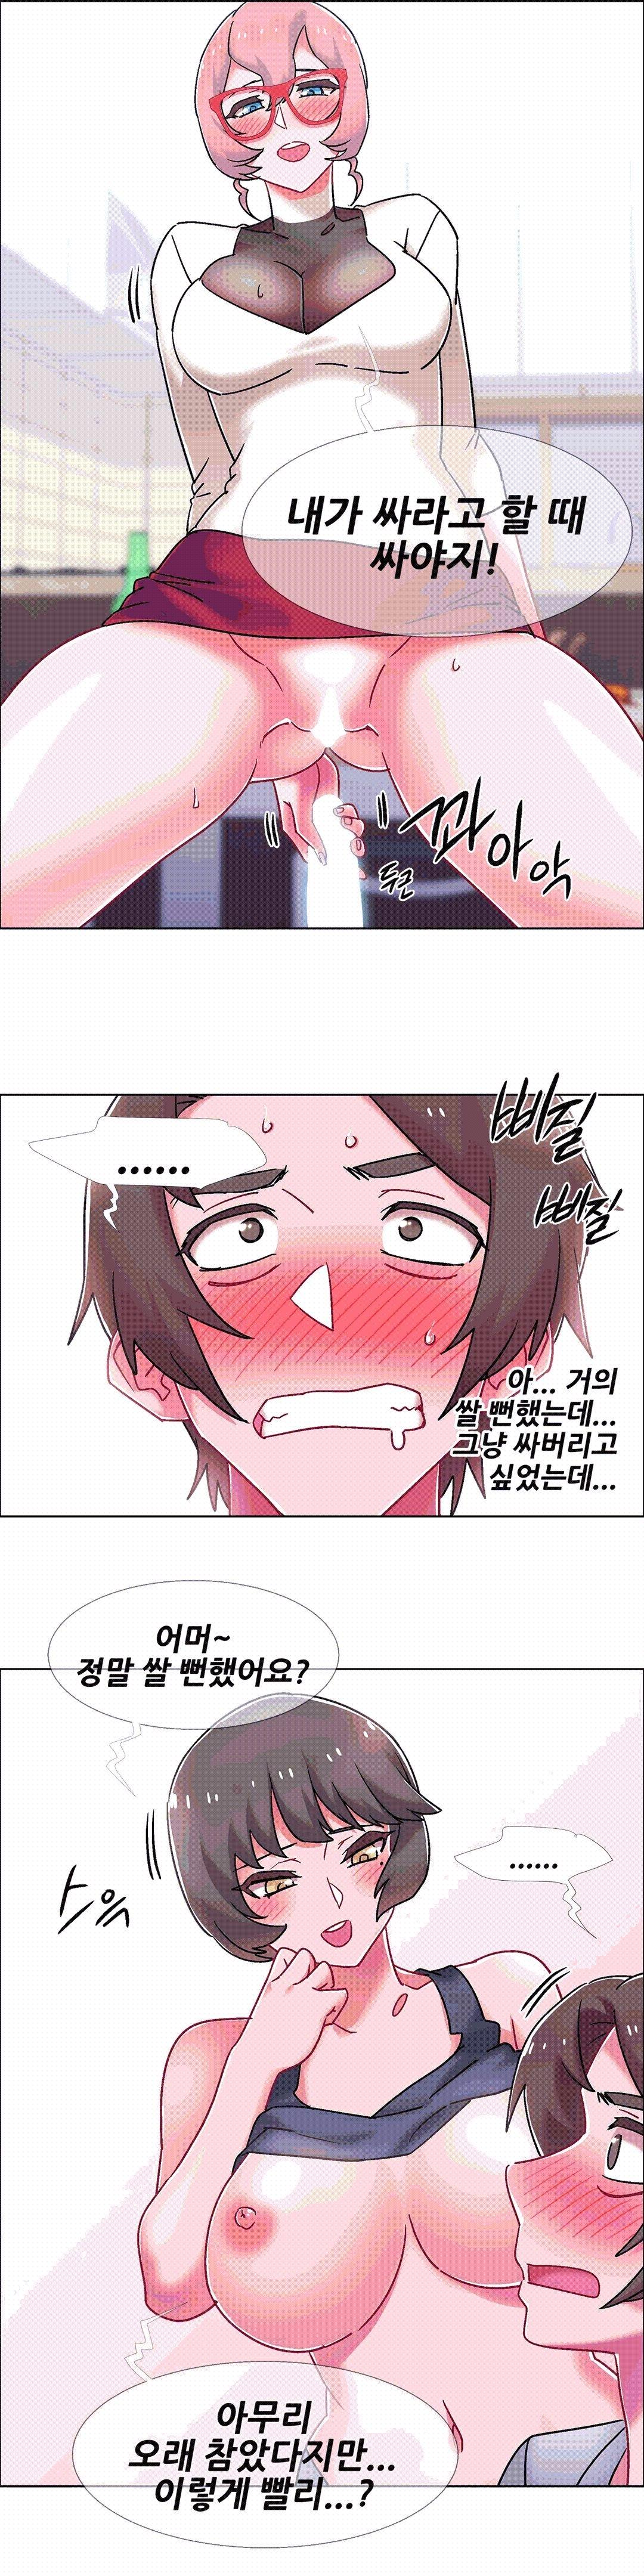 [Studio Wannabe] Rental Girls | 出租女郎 Ch. 33-58 [Chinese]  第二季 完结 597